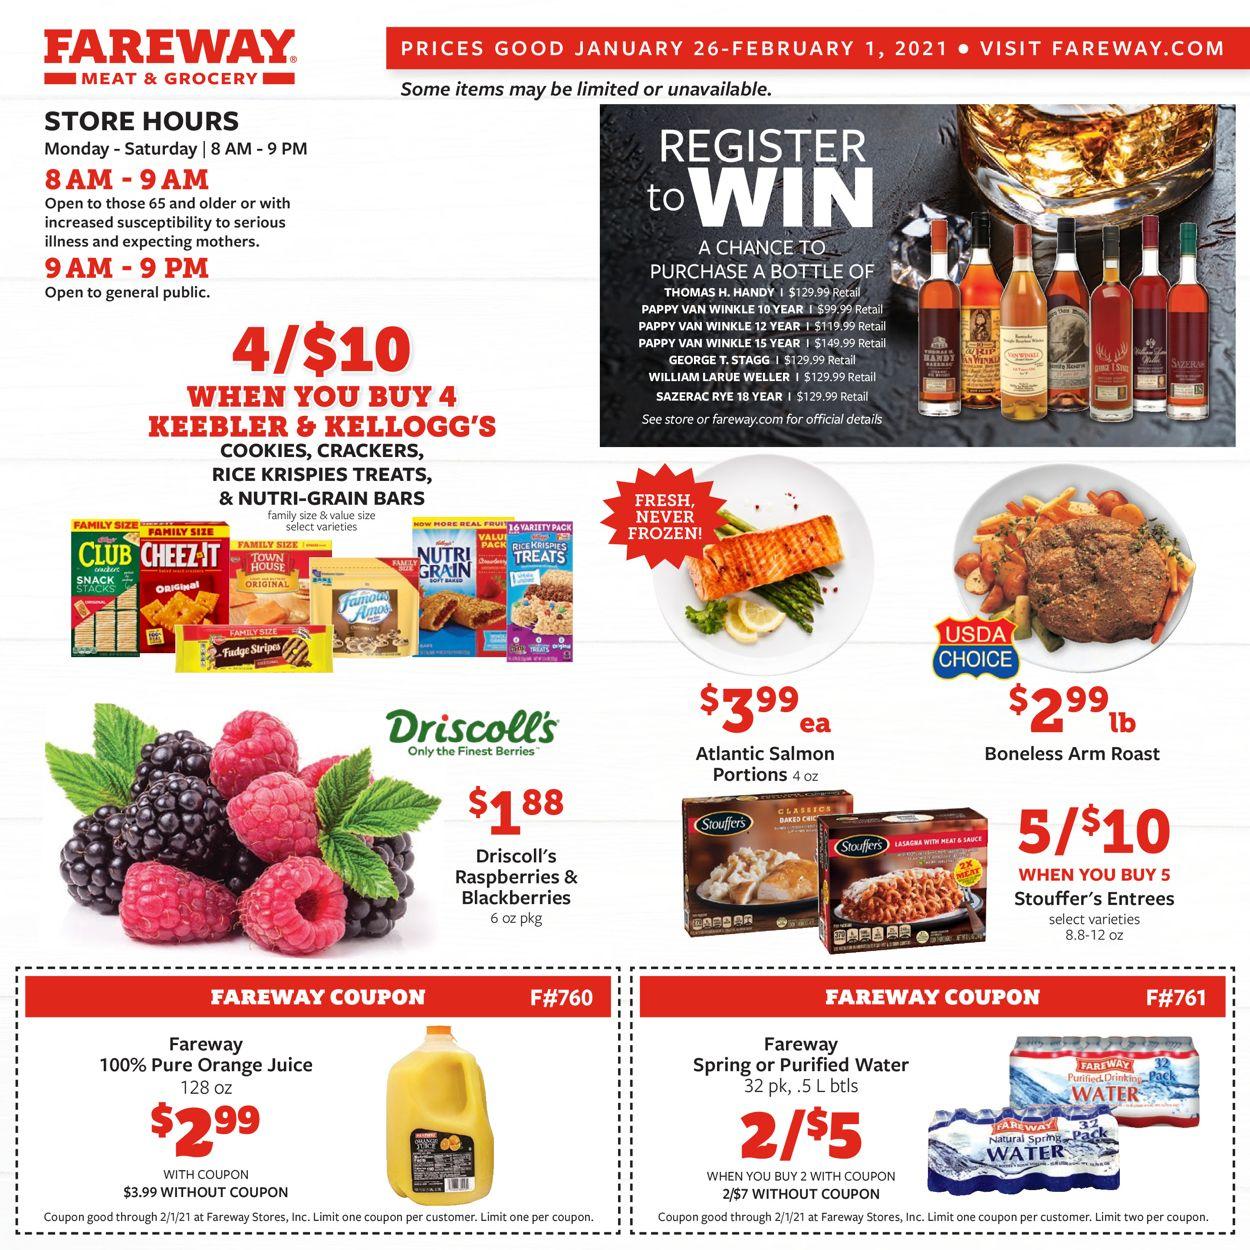 Fareway Weekly Ad Circular - valid 01/26-02/01/2021